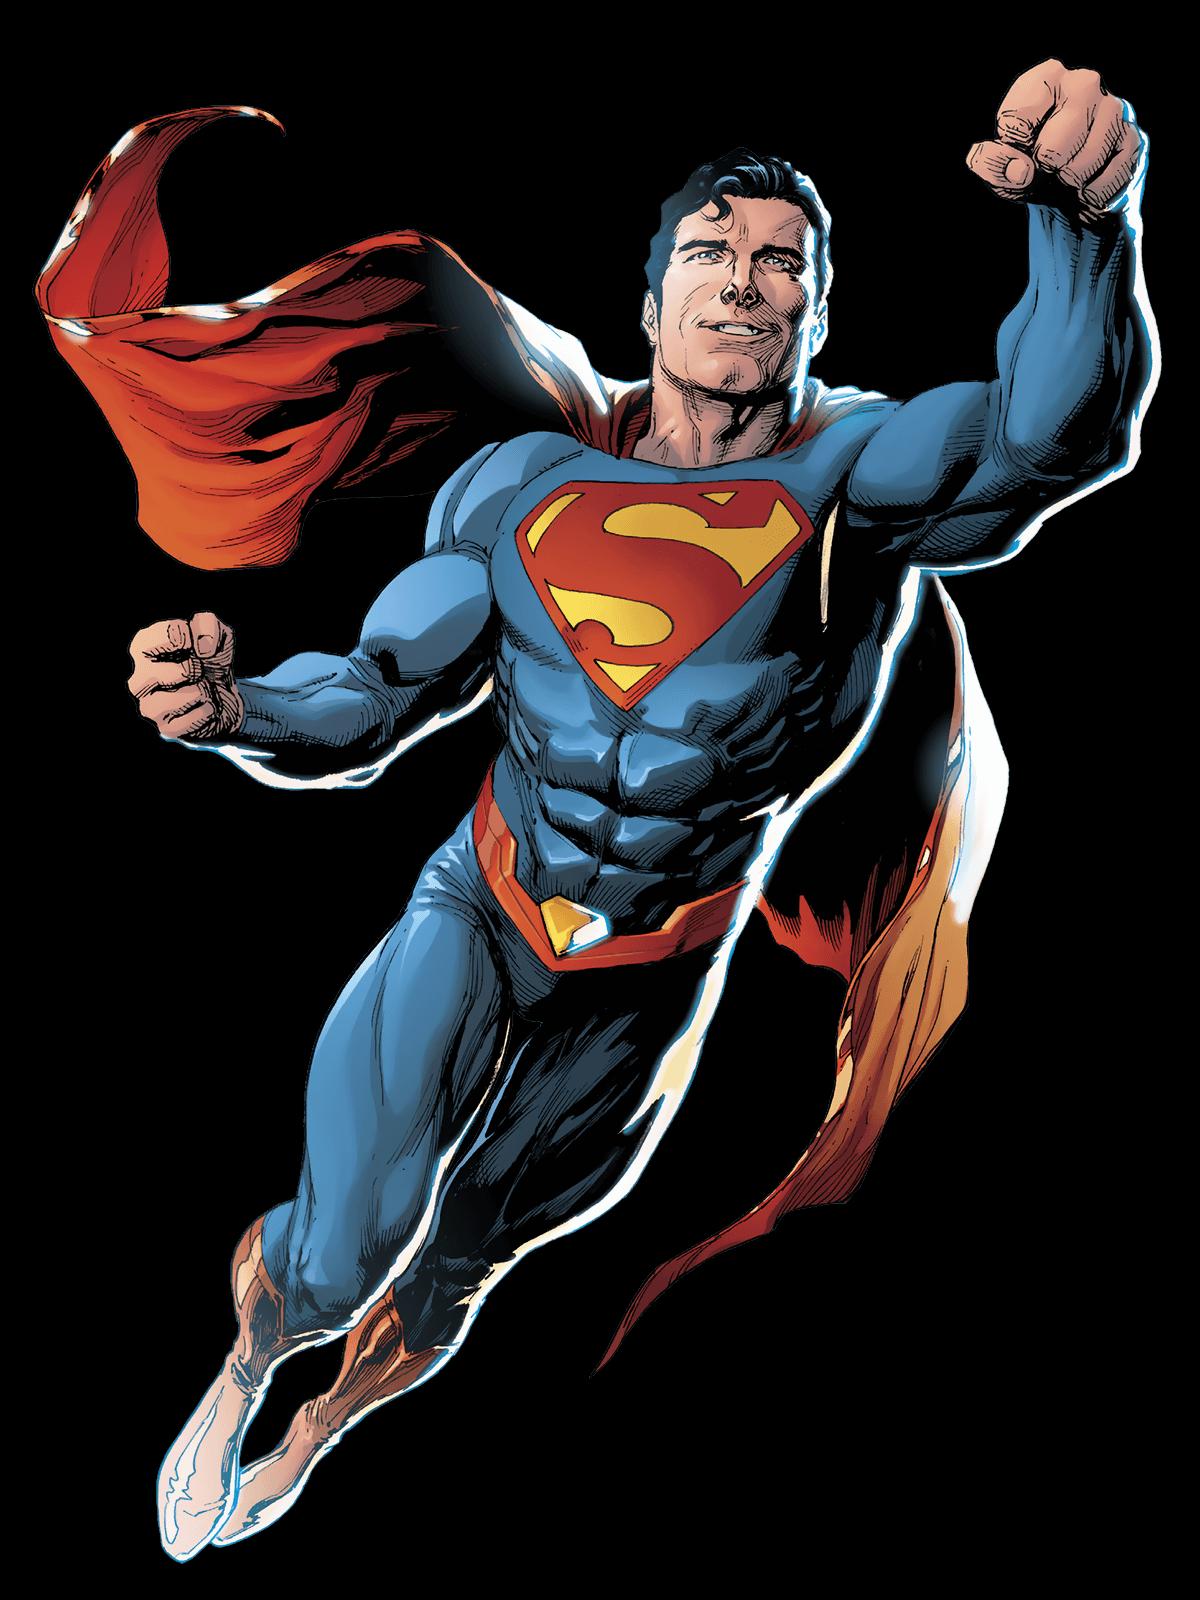 superman cartoon image  Superman Cartoon Png Classic